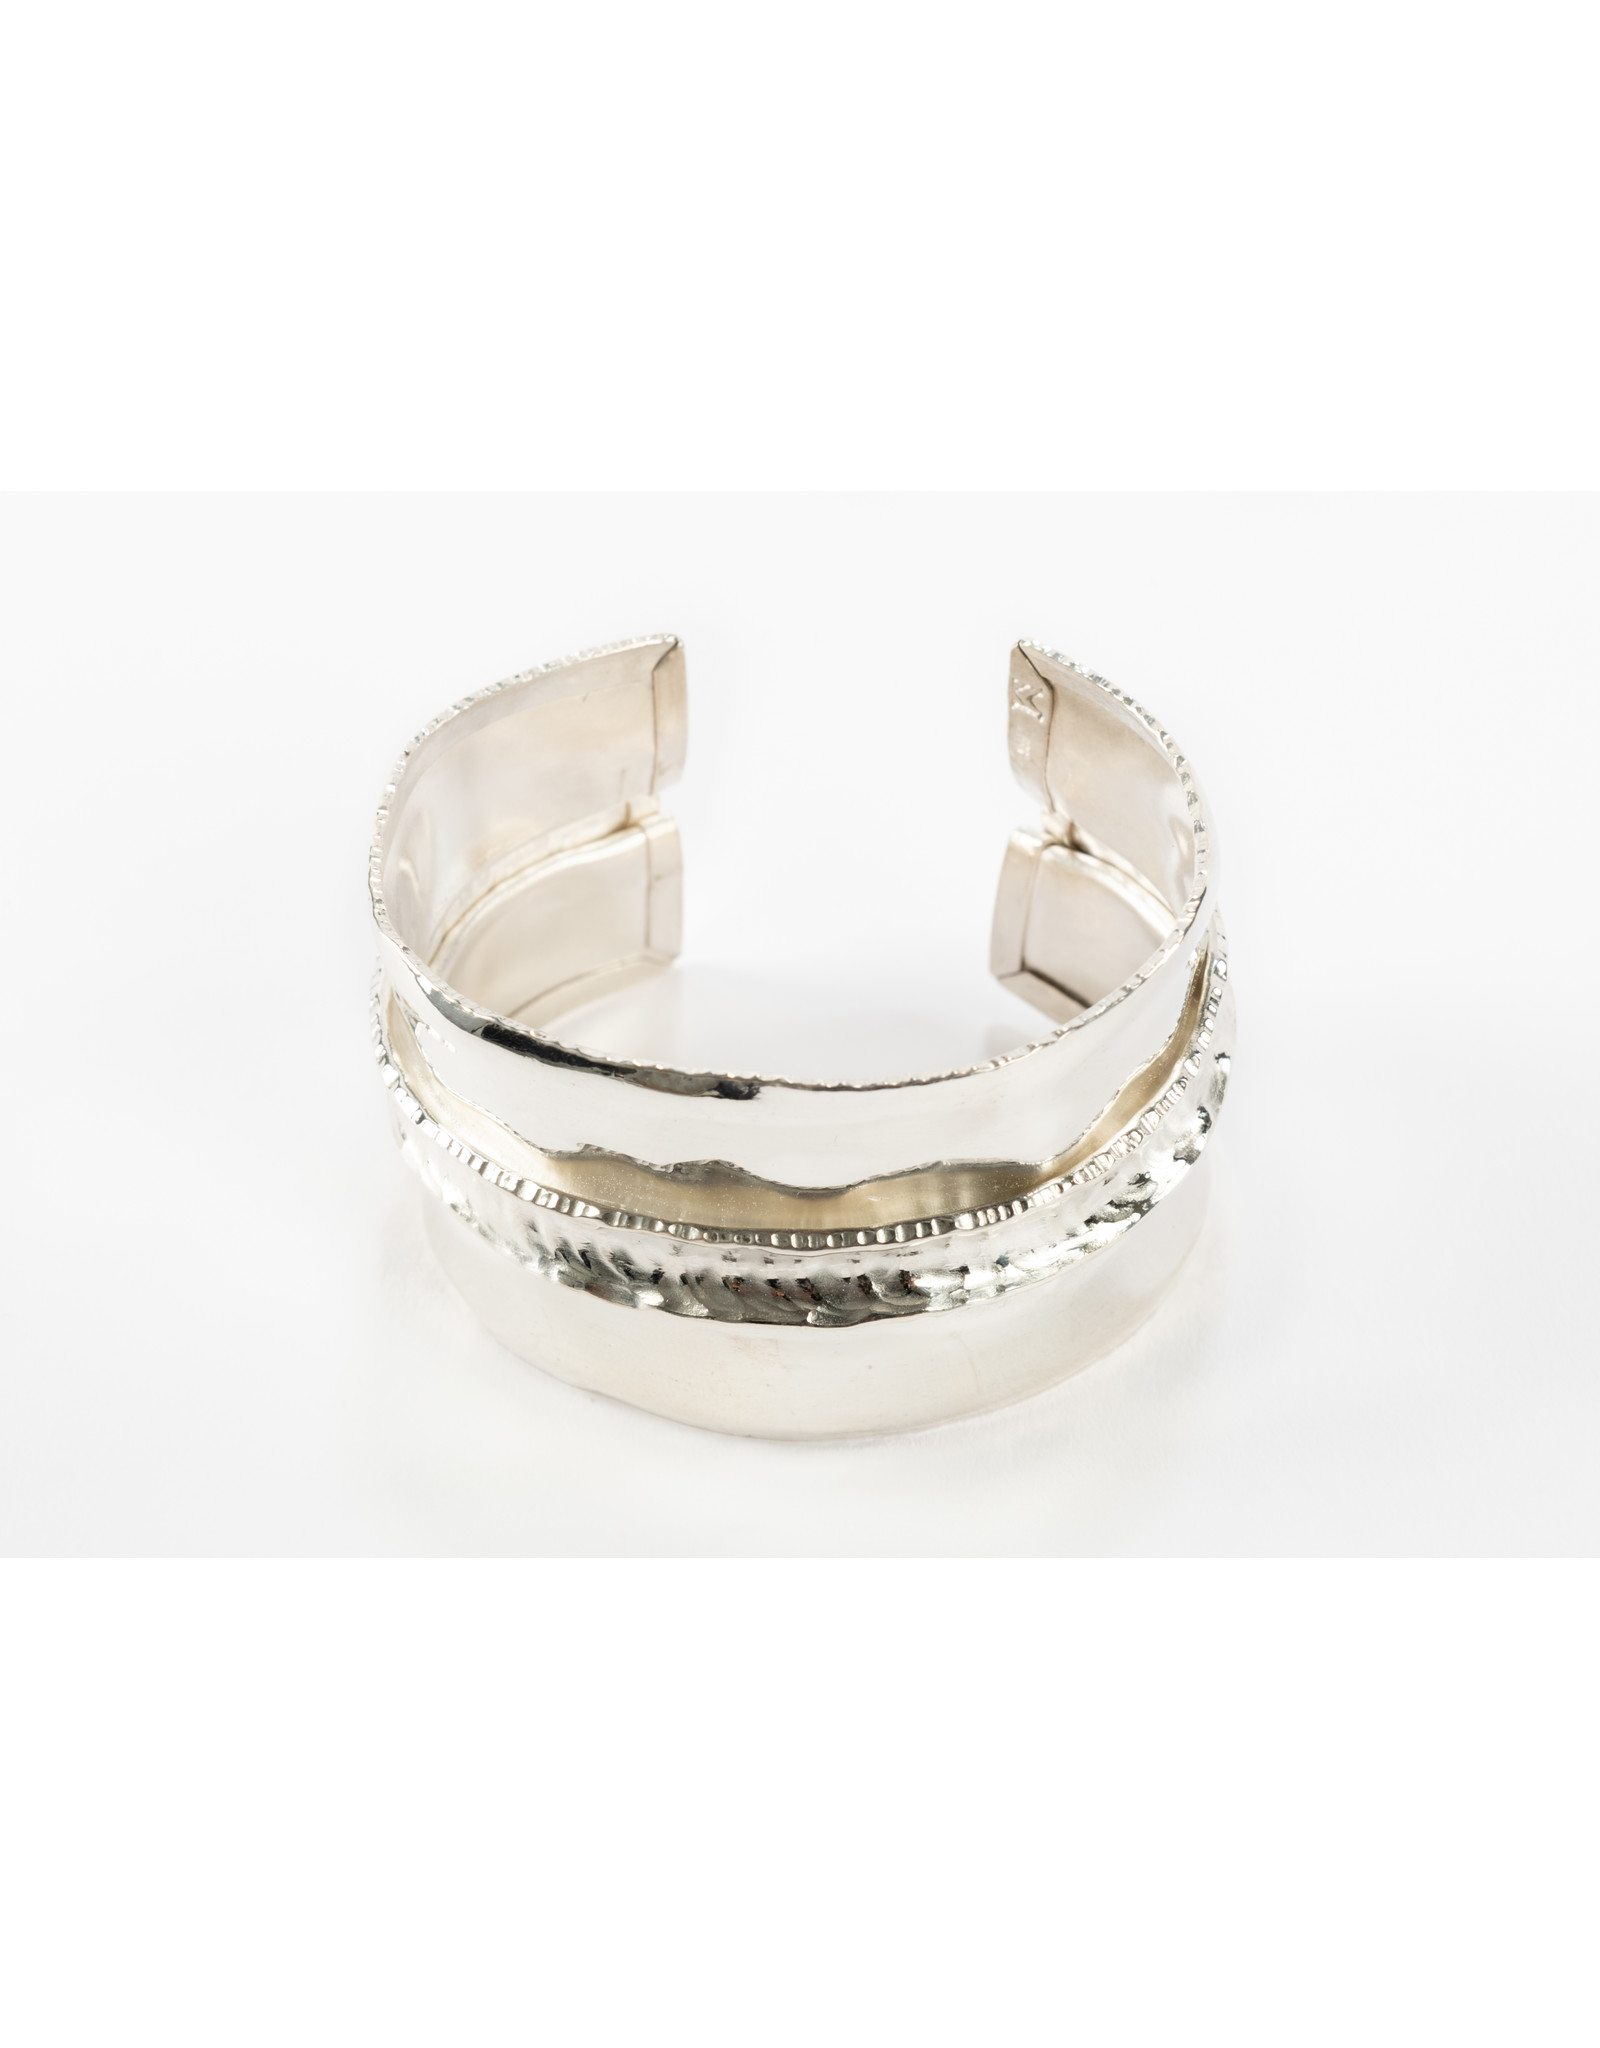 Karen Wawer Cuff Bracelet by Karen Wawer